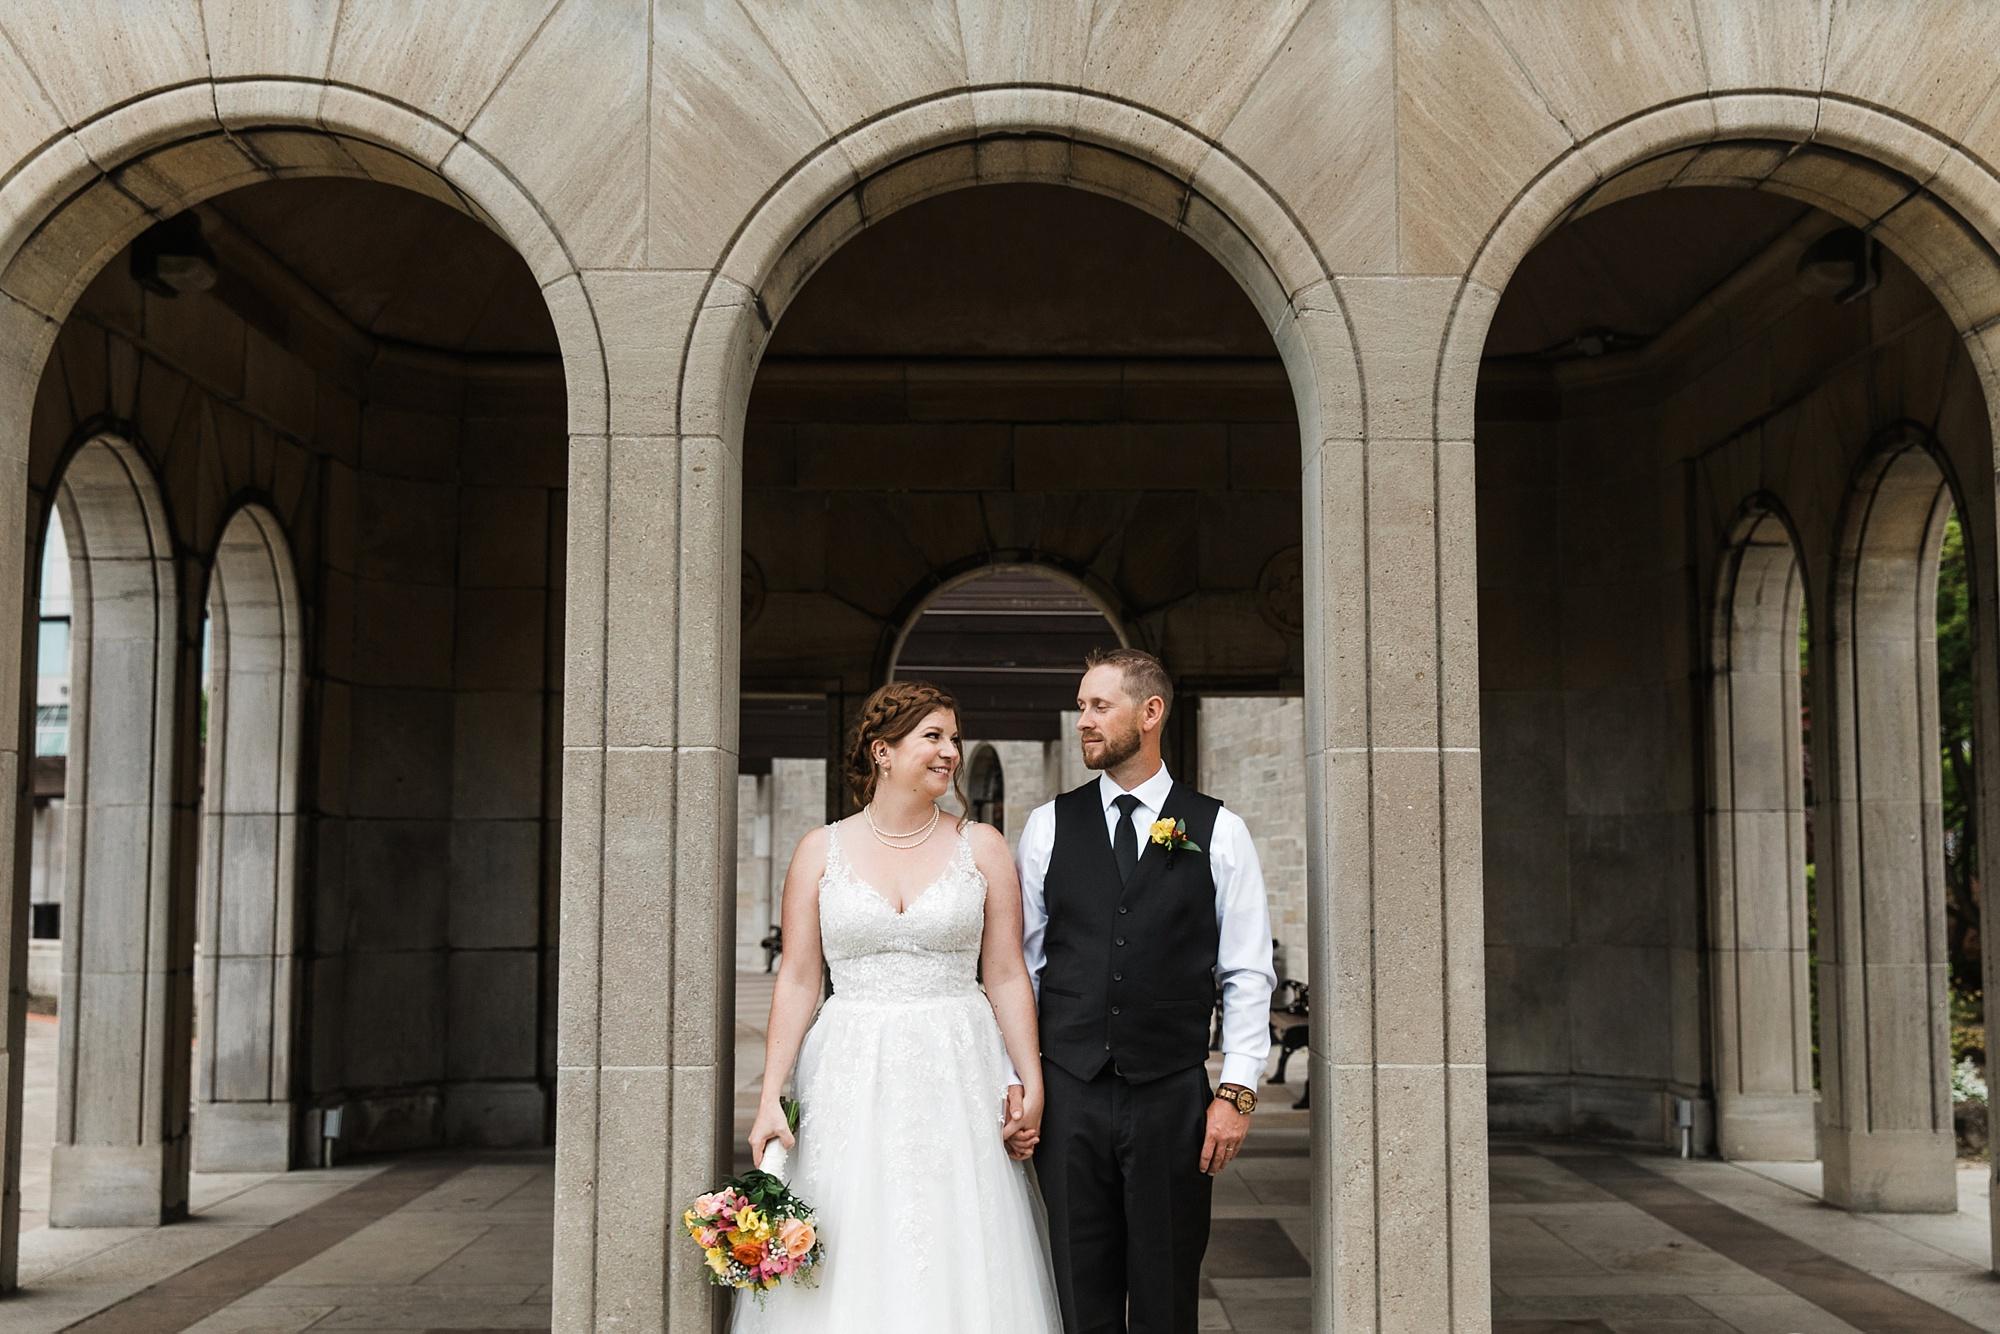 niagarafalls-weddingphotography_0052.jpg